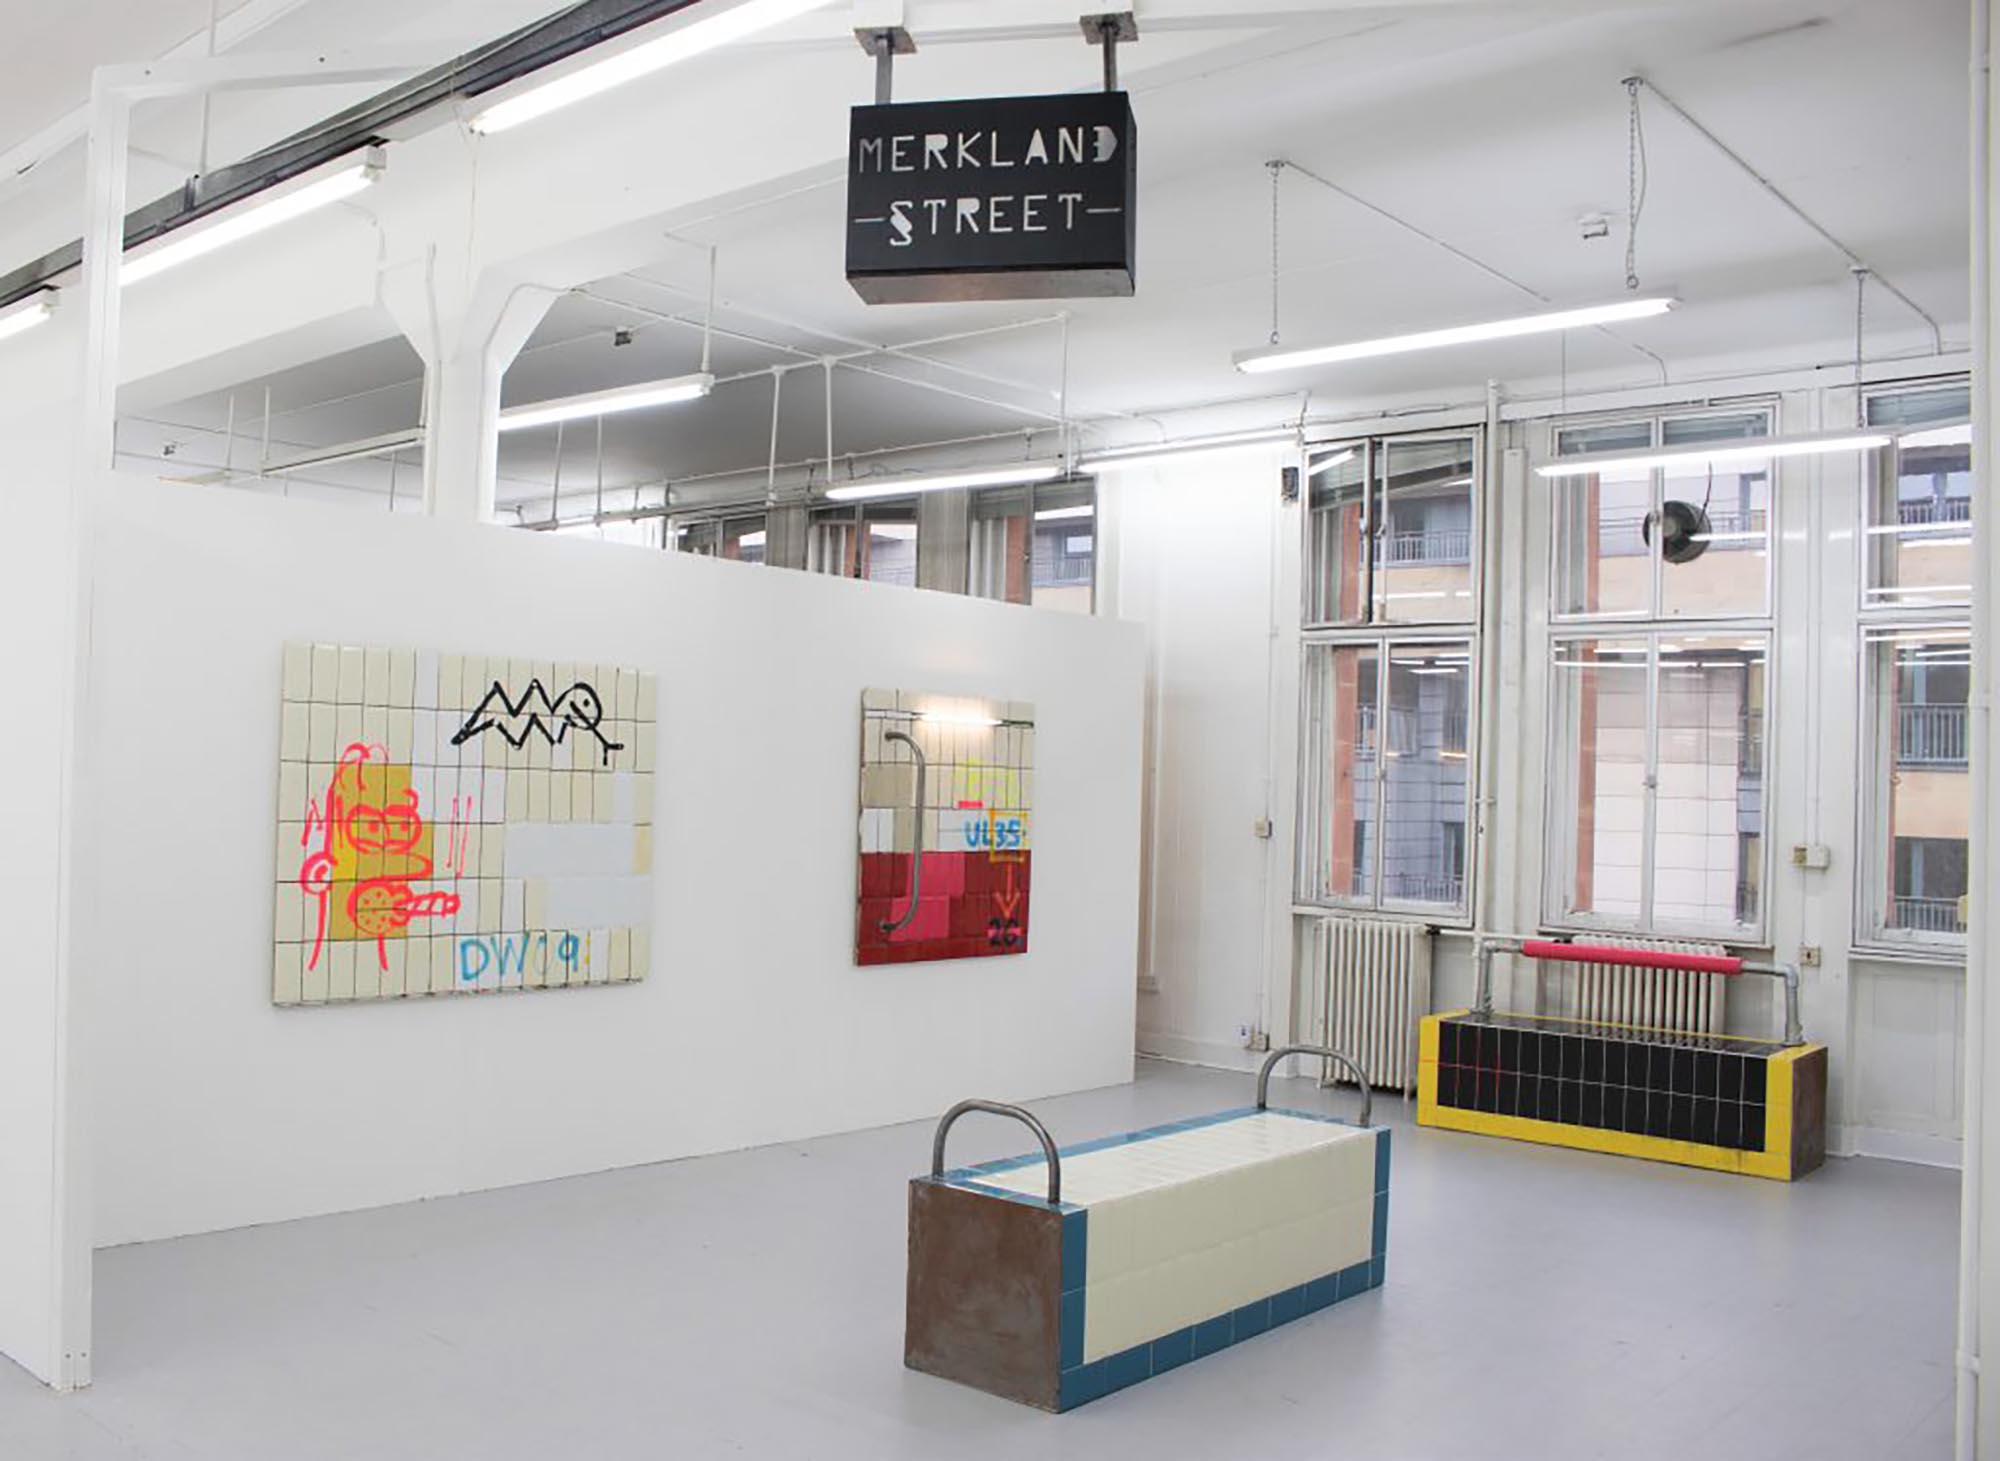 Selection of work from 'Merkland Street', 2018. Photo credit:  Stephen Burke